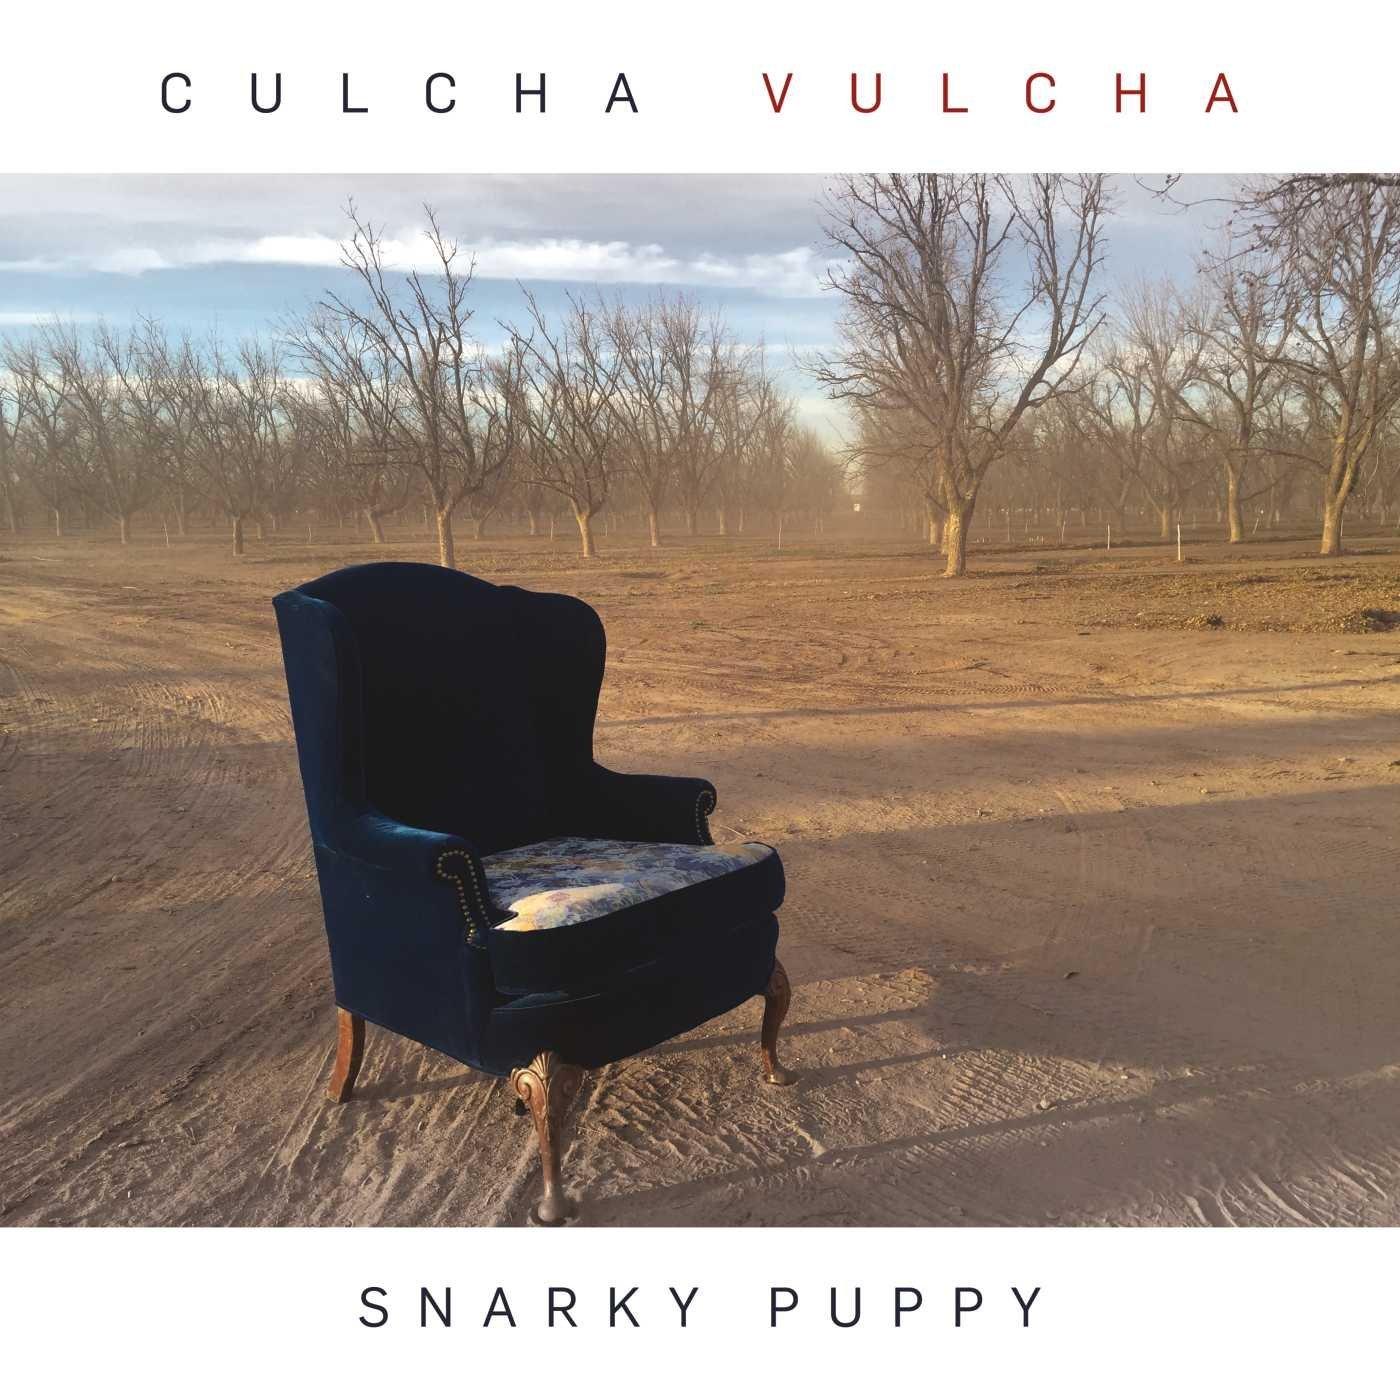 Snarky Puppy</br>Culcha Vulcha</br>Decca, 2016